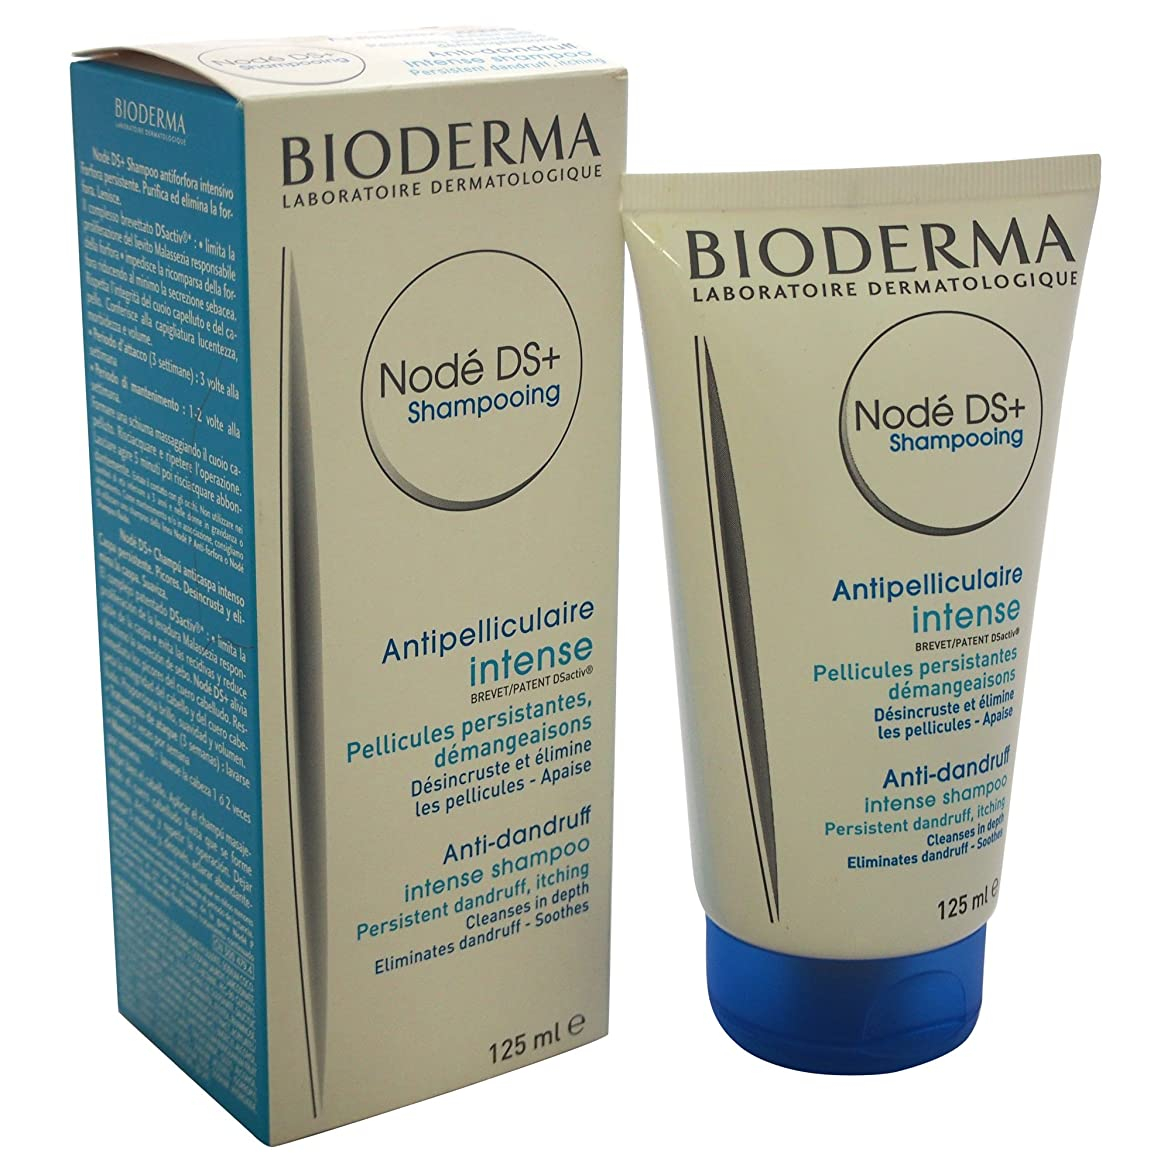 衣服所得不変Bioderma Node Ds Cream Shampoo 125ml [並行輸入品]